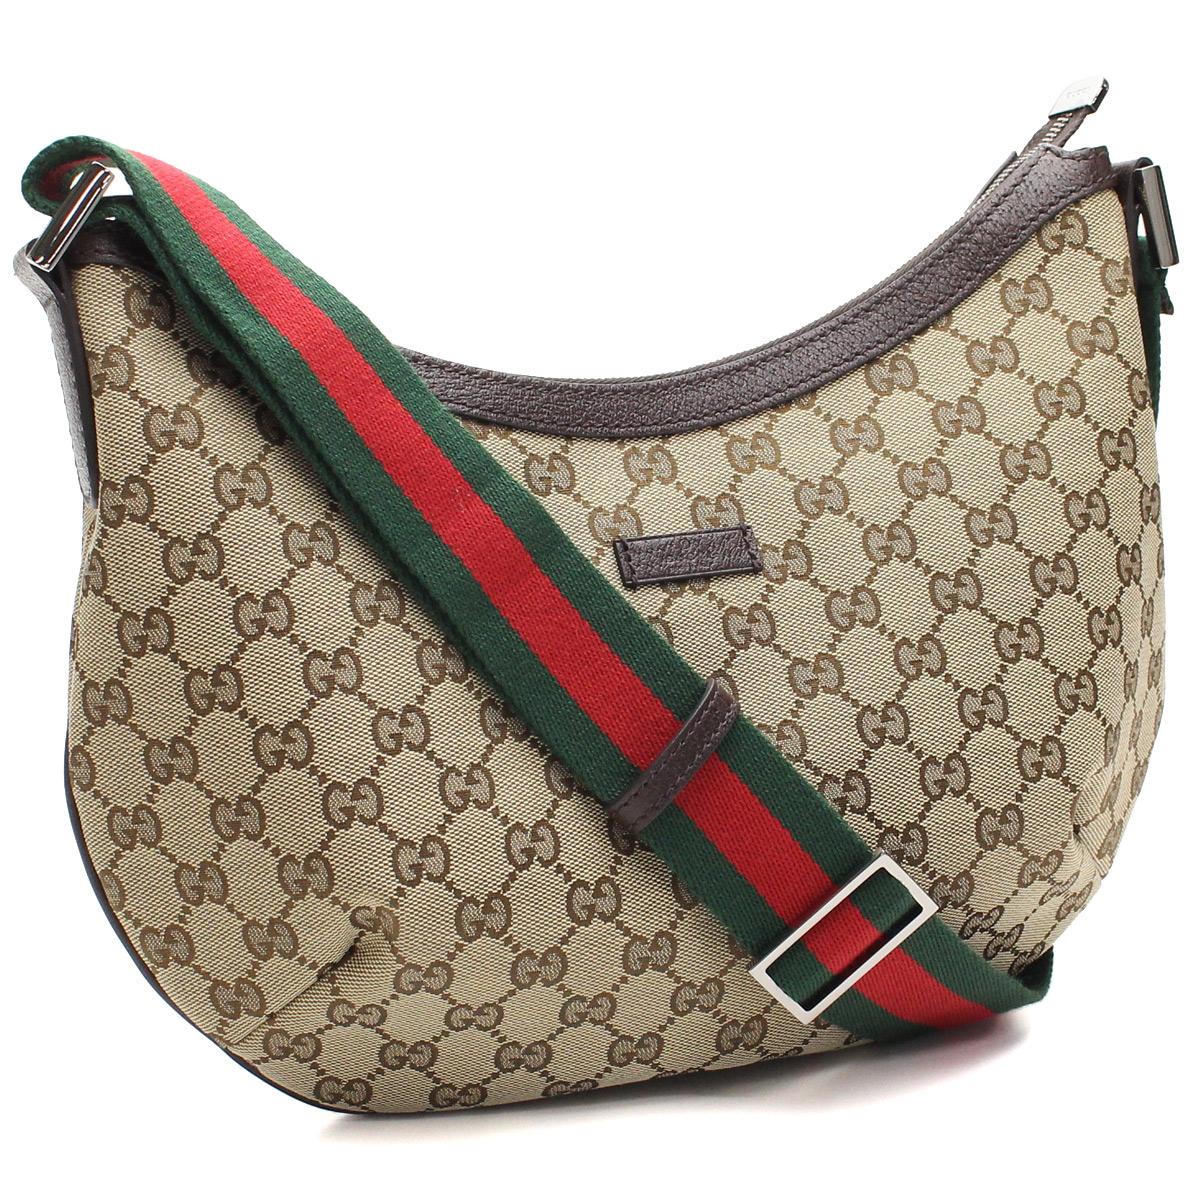 Bighit The Total Brand Wholesale Gucci Messenger Furla Metropolis Bronze Authentic Diagonal Shoulder Bag 181092 Kqwgr 9791 Brown Taxfree Send By Ems A